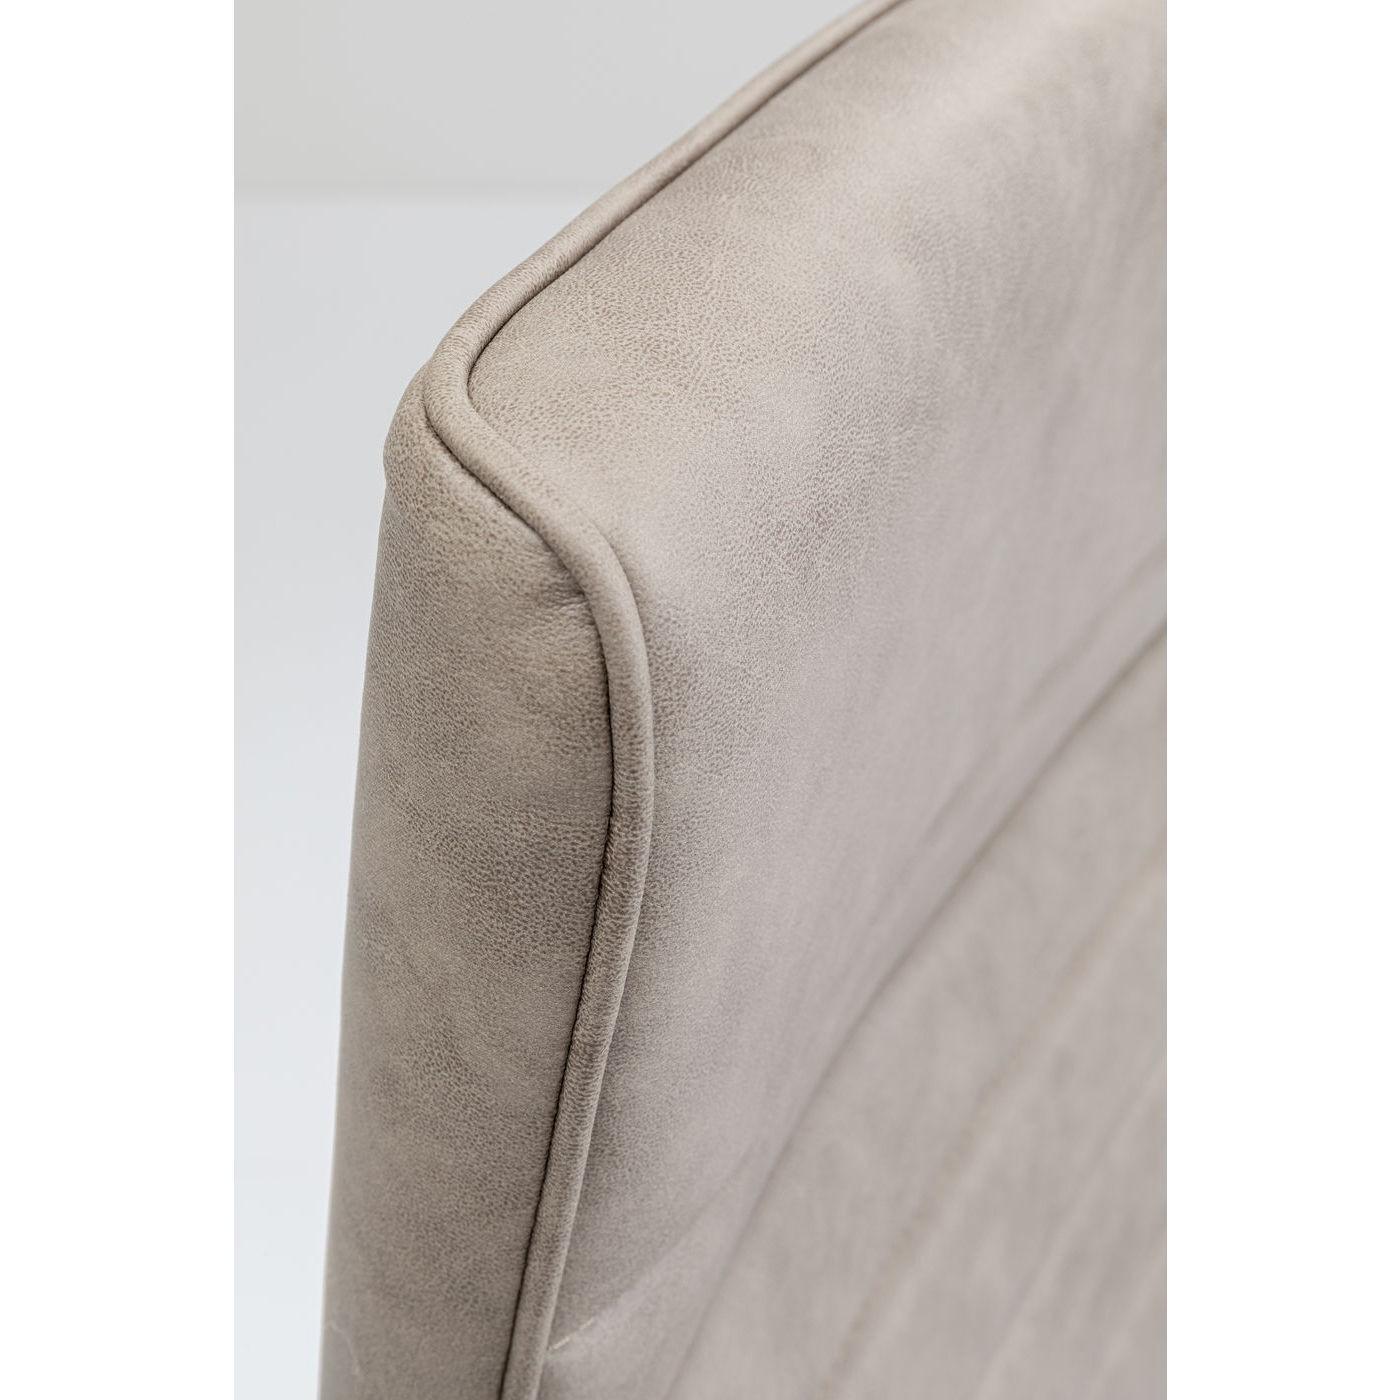 Chaise de bureau Labora haute taupe Kare Design